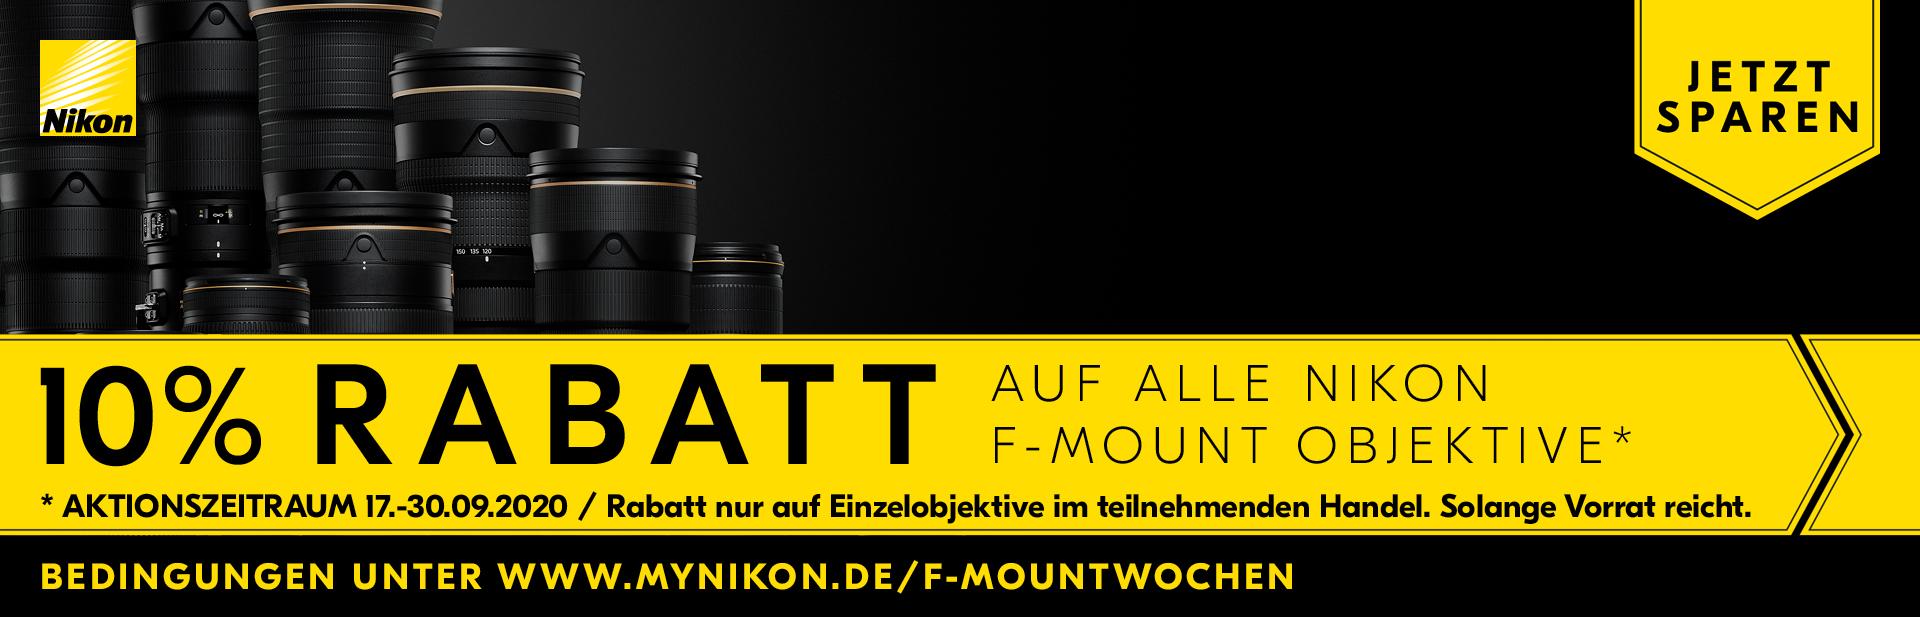 Nikon Lens Promo 10% Sofortrabatt Aktion